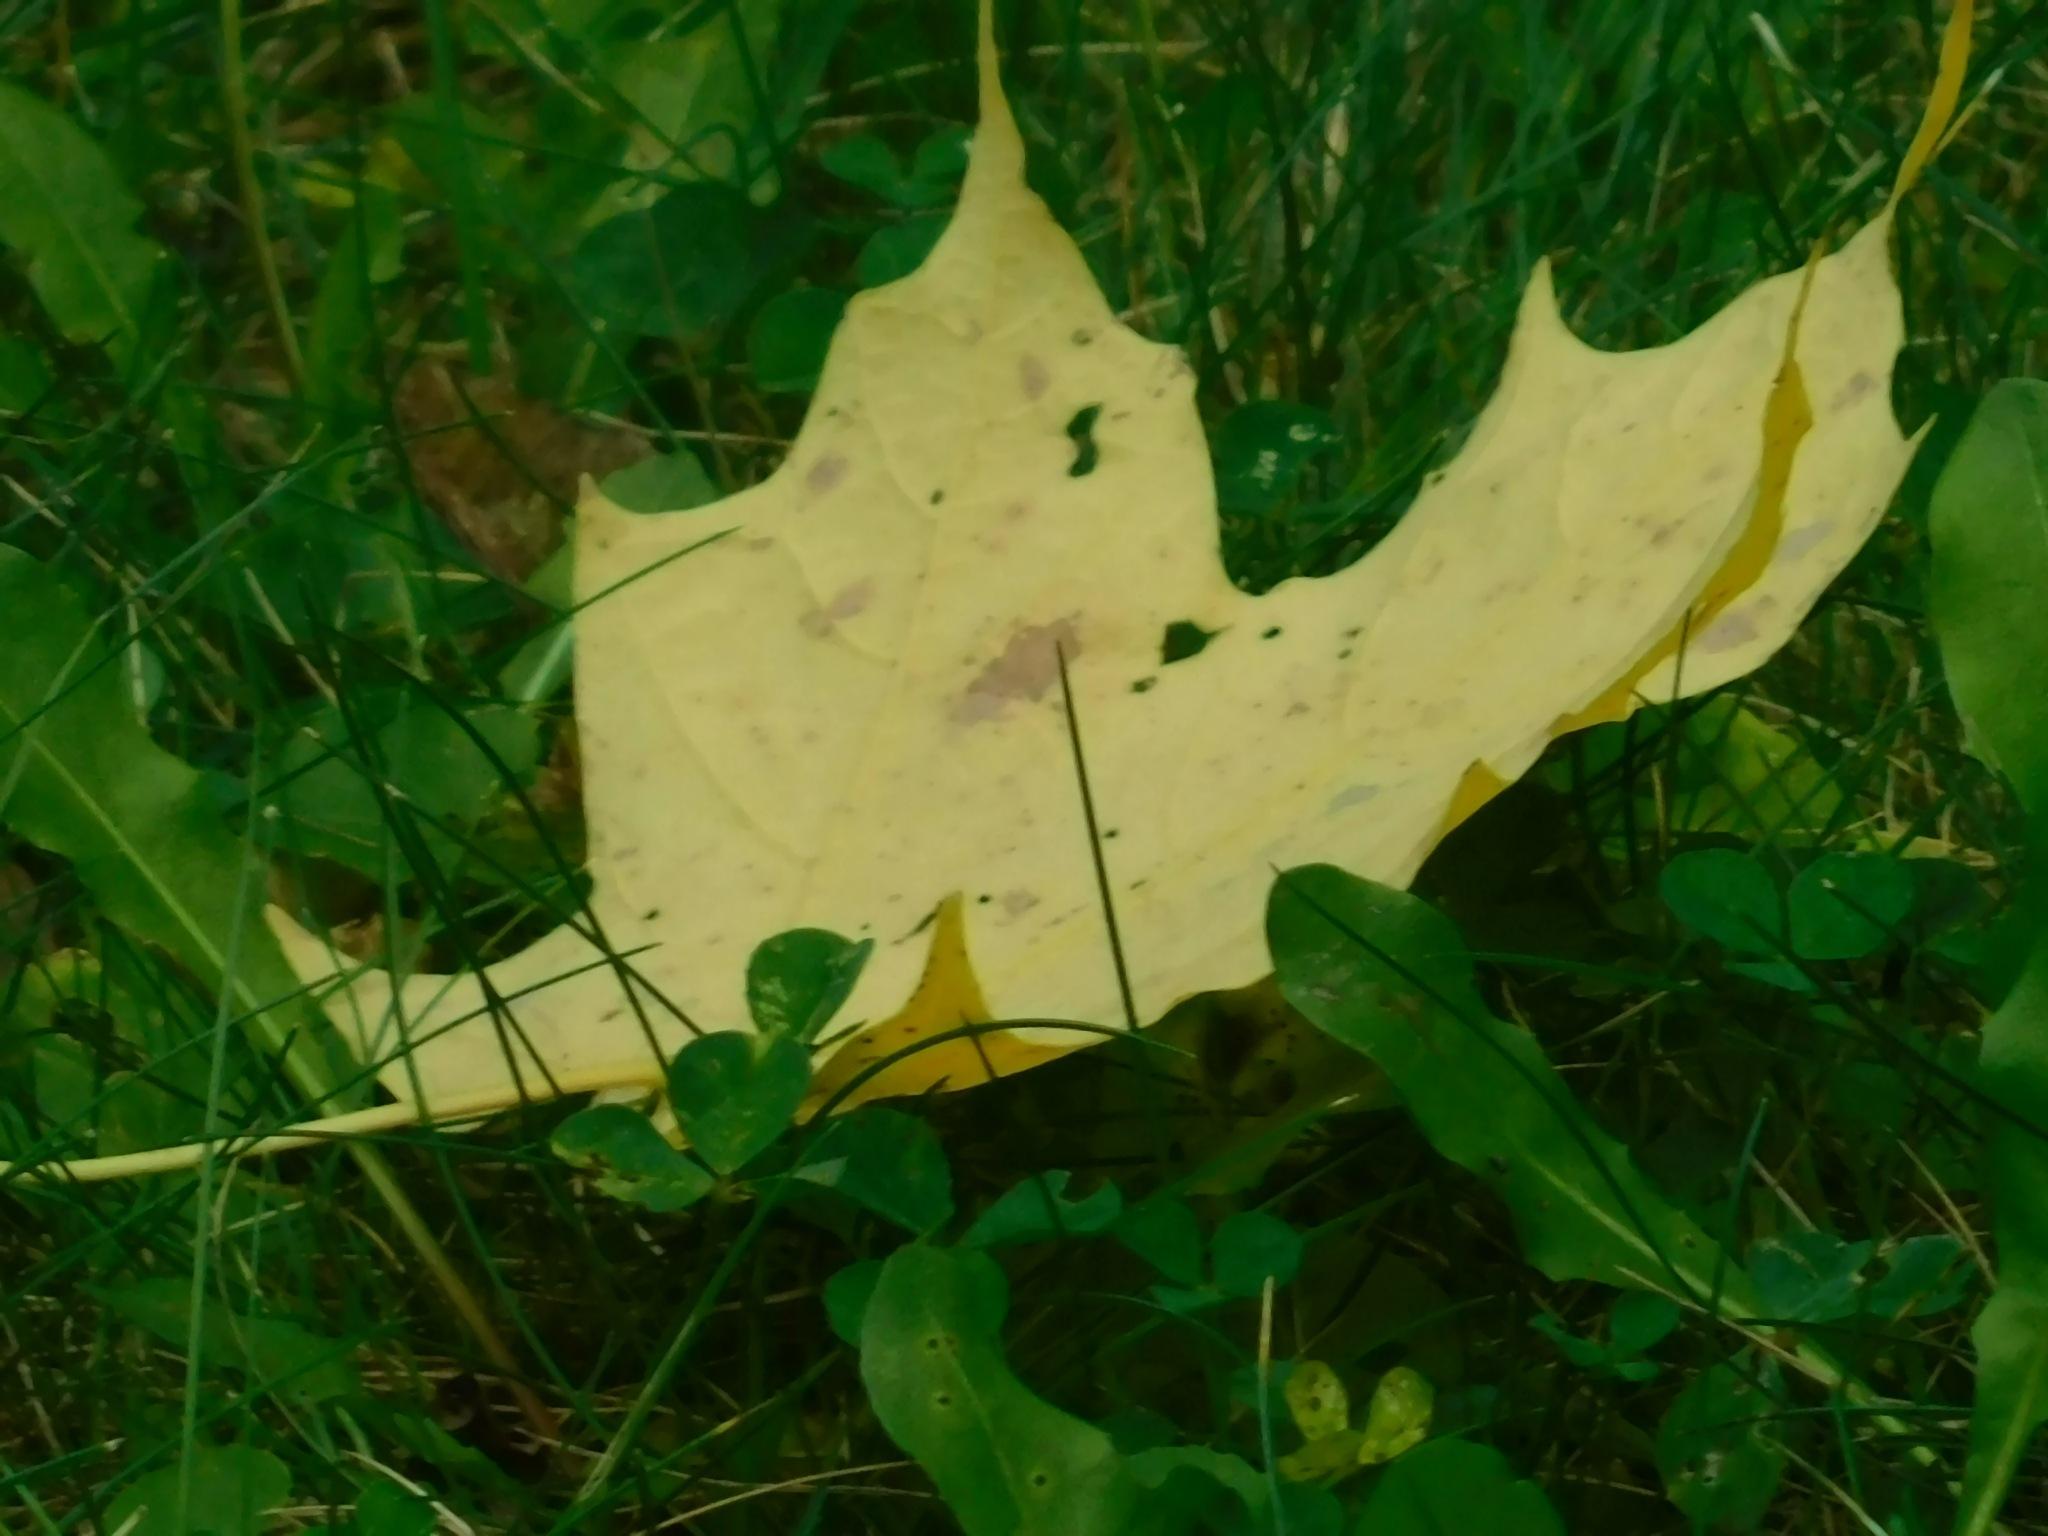 A Single Leaf by Stacey J. Cunningham